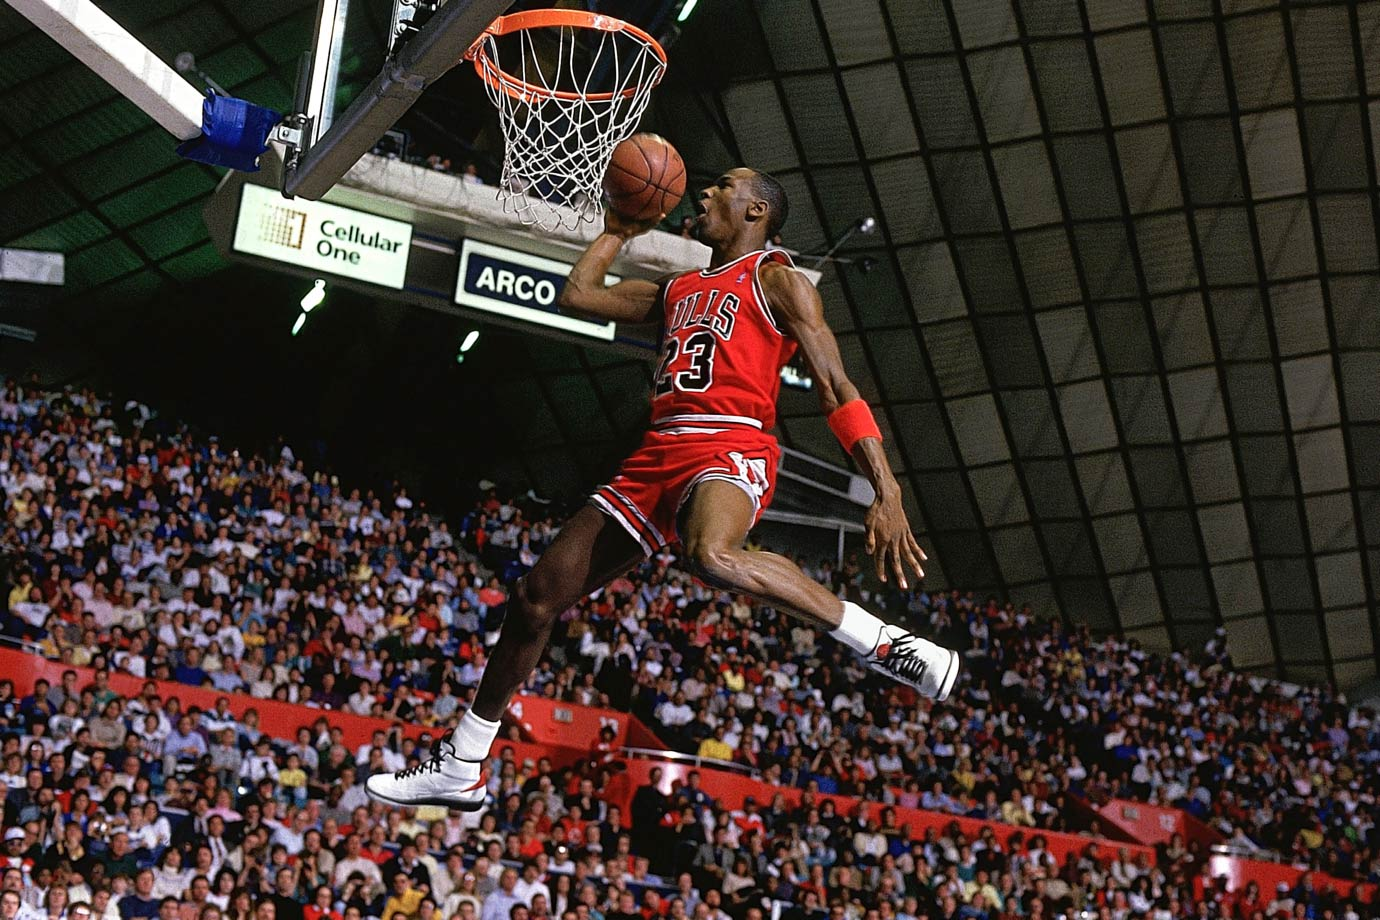 1987-Michael-Jordan-001283802.jpg